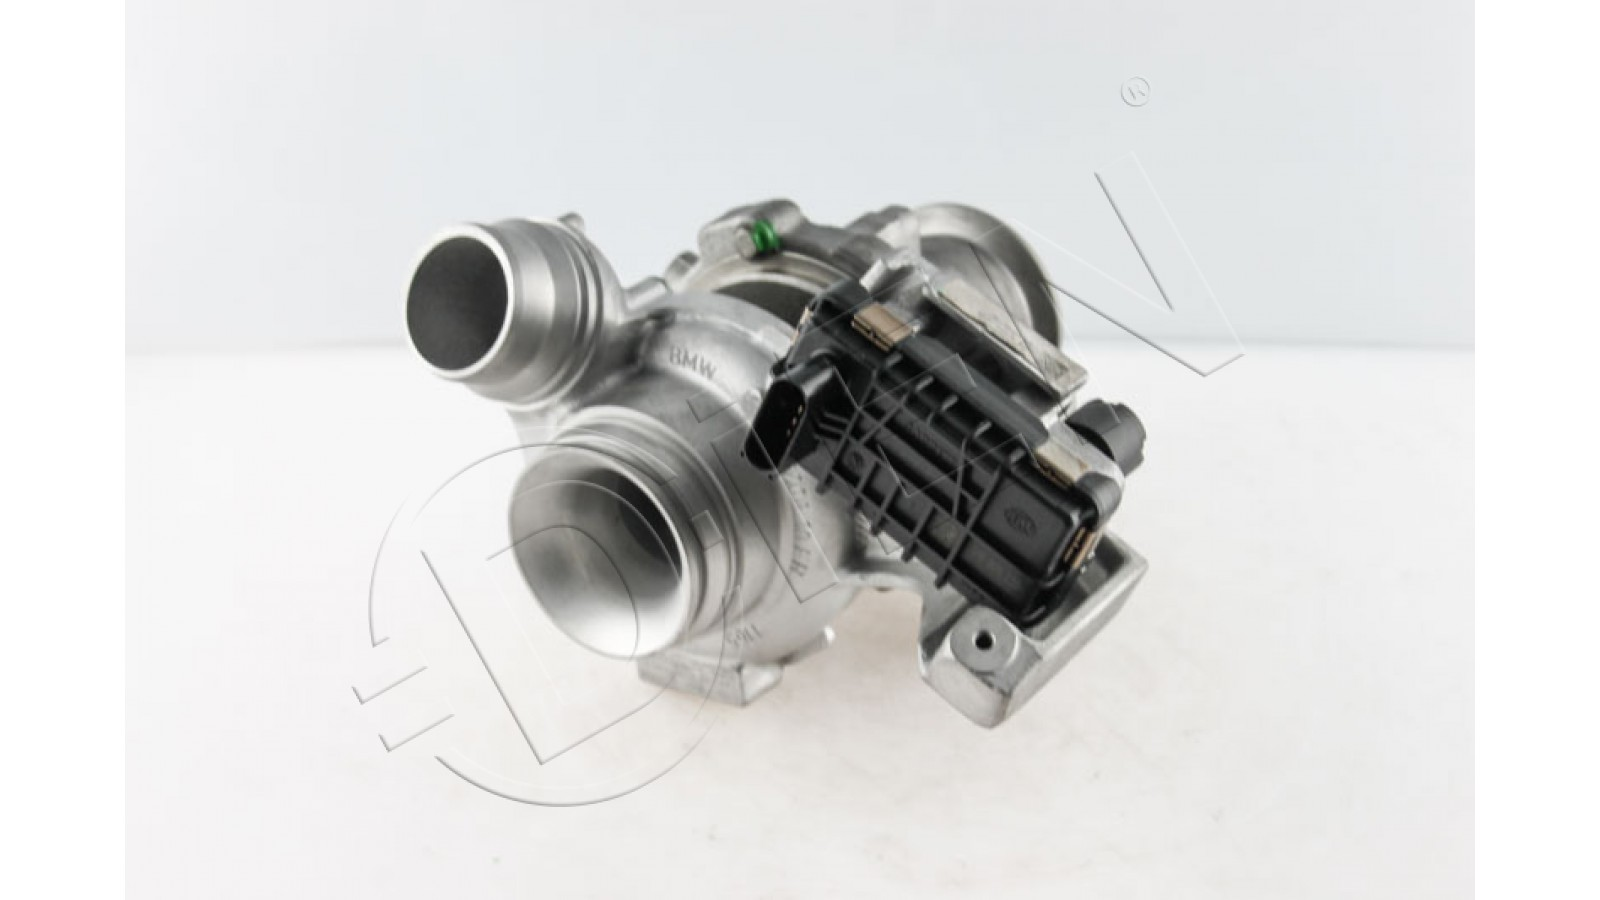 Turbocompressore rigenerato per BMW SERIE 1 Cabriolet 118 d 143Cv